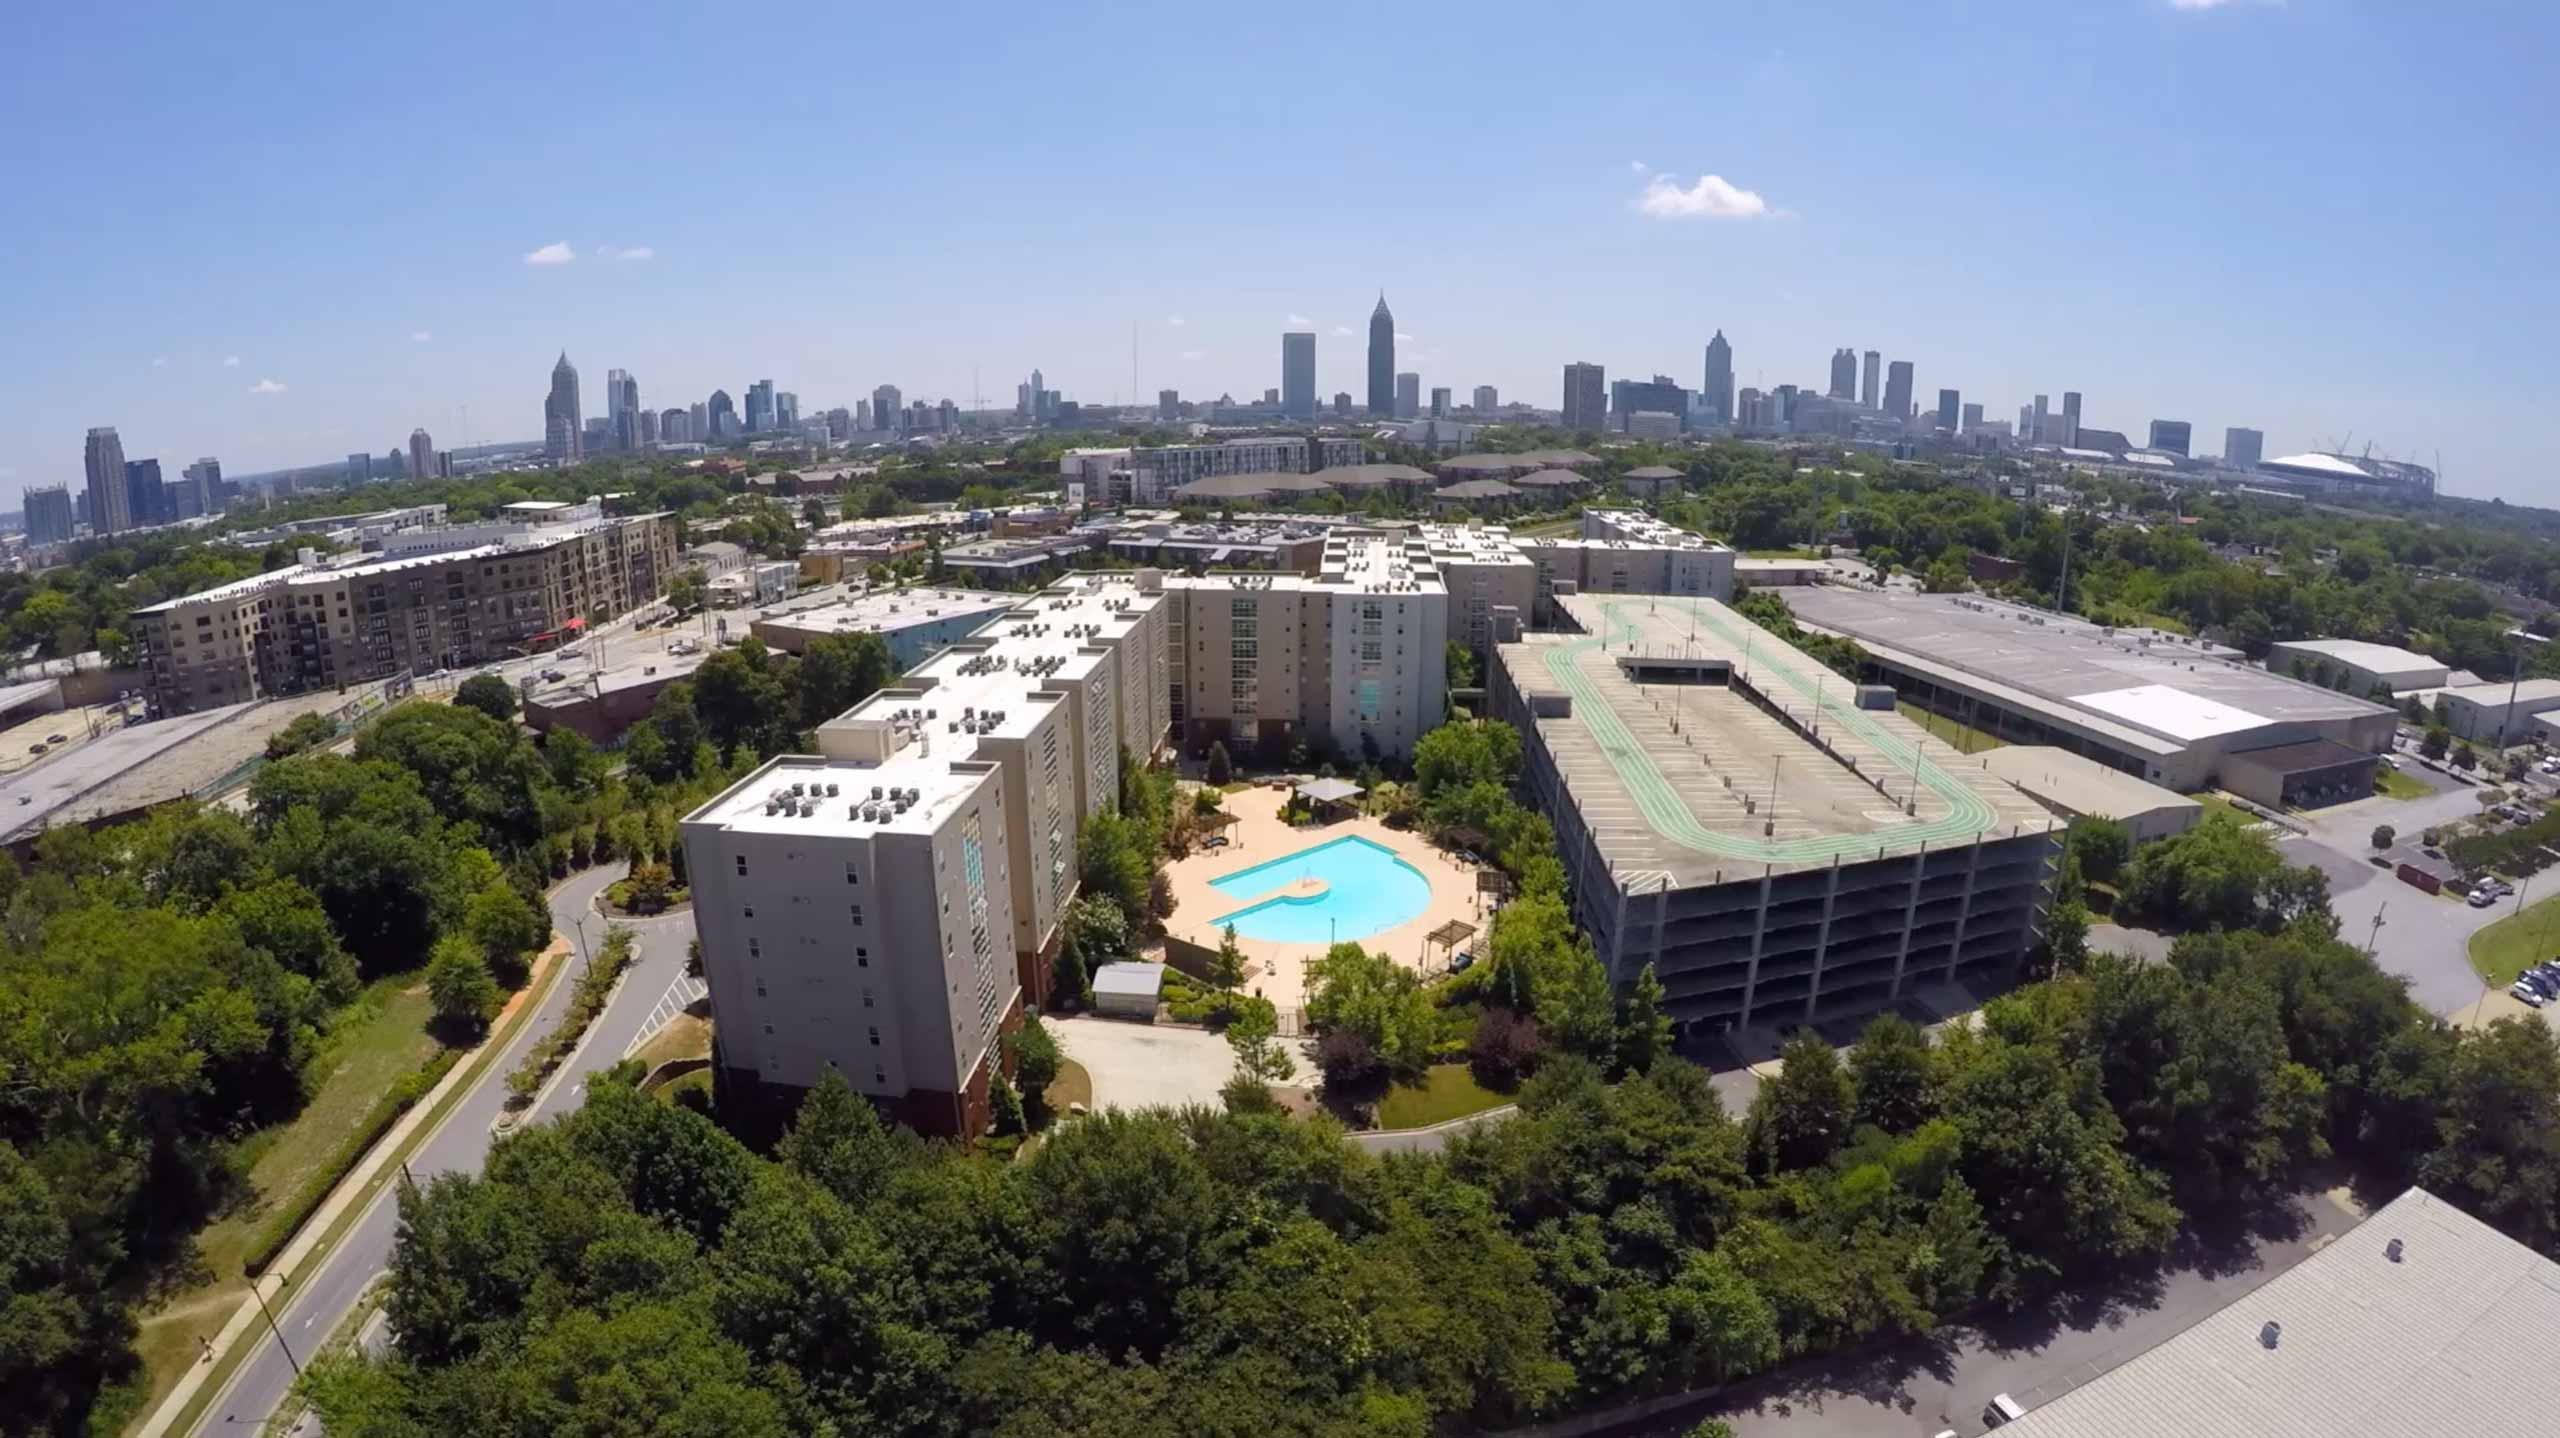 Westmar Lofts: Modern Student Housing In Atlanta, GA